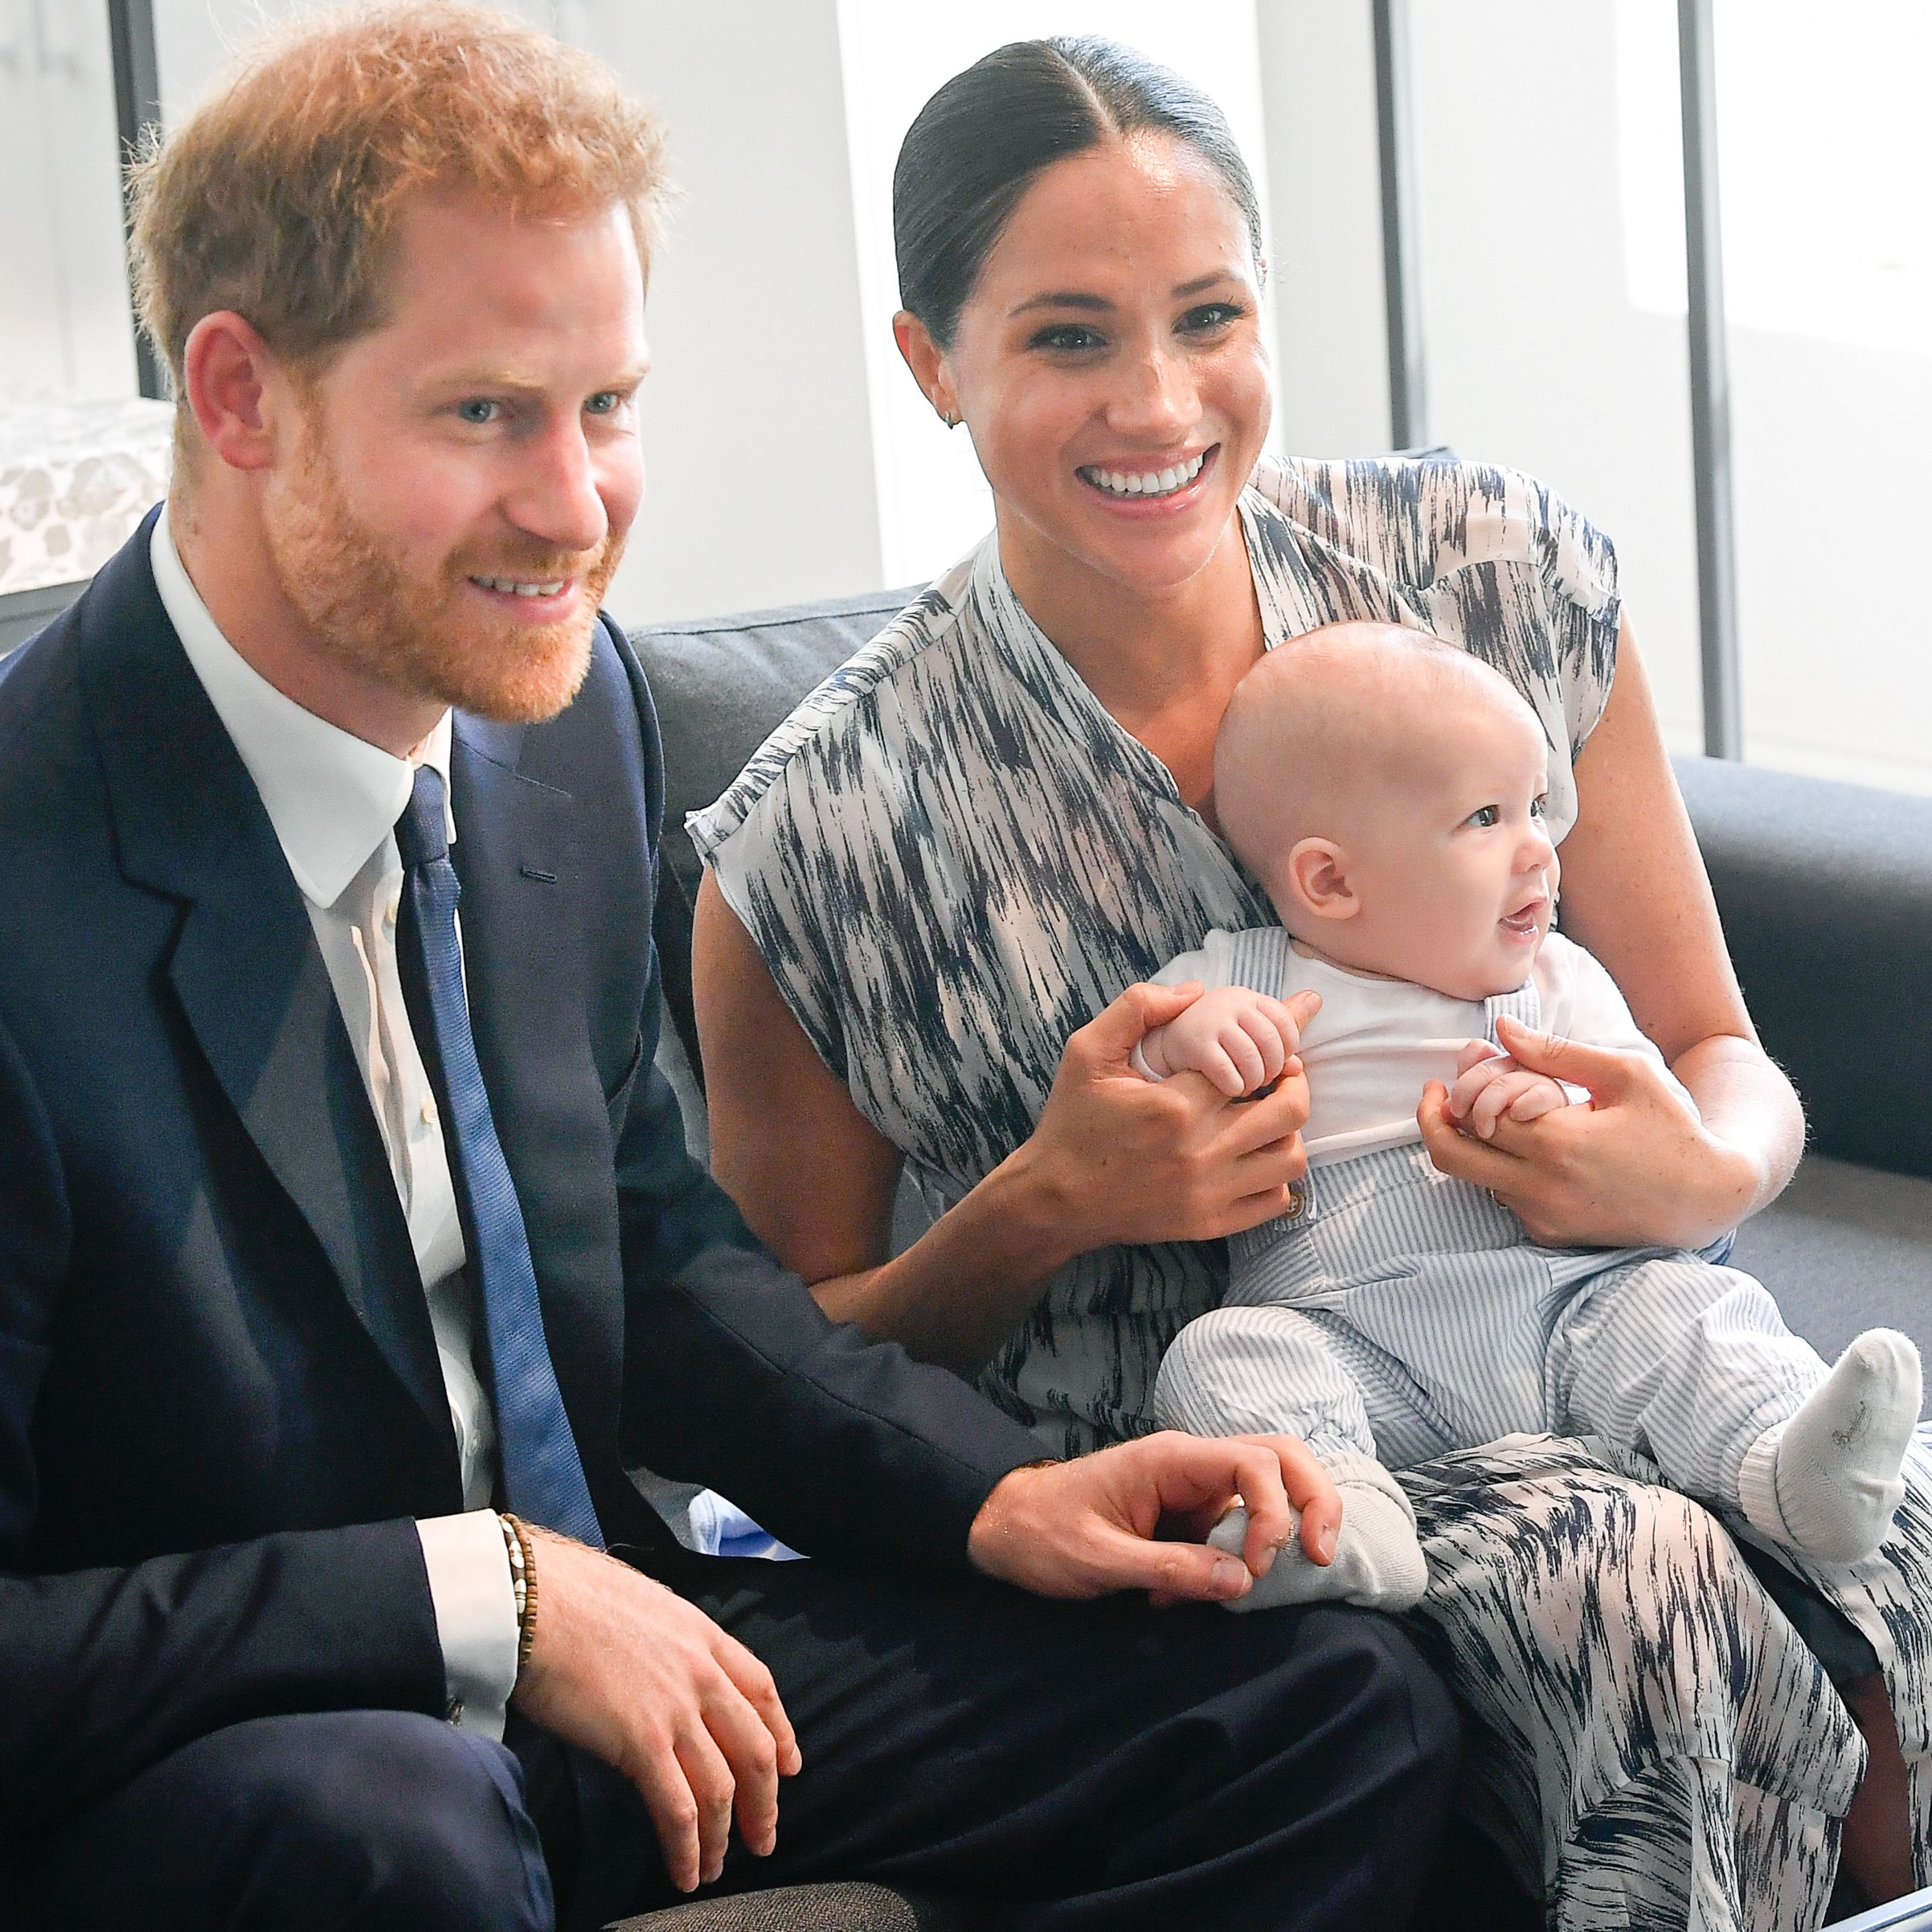 Meghan Markle Revealed the Heartfelt Father's Day Gift She Gave Prince Harry